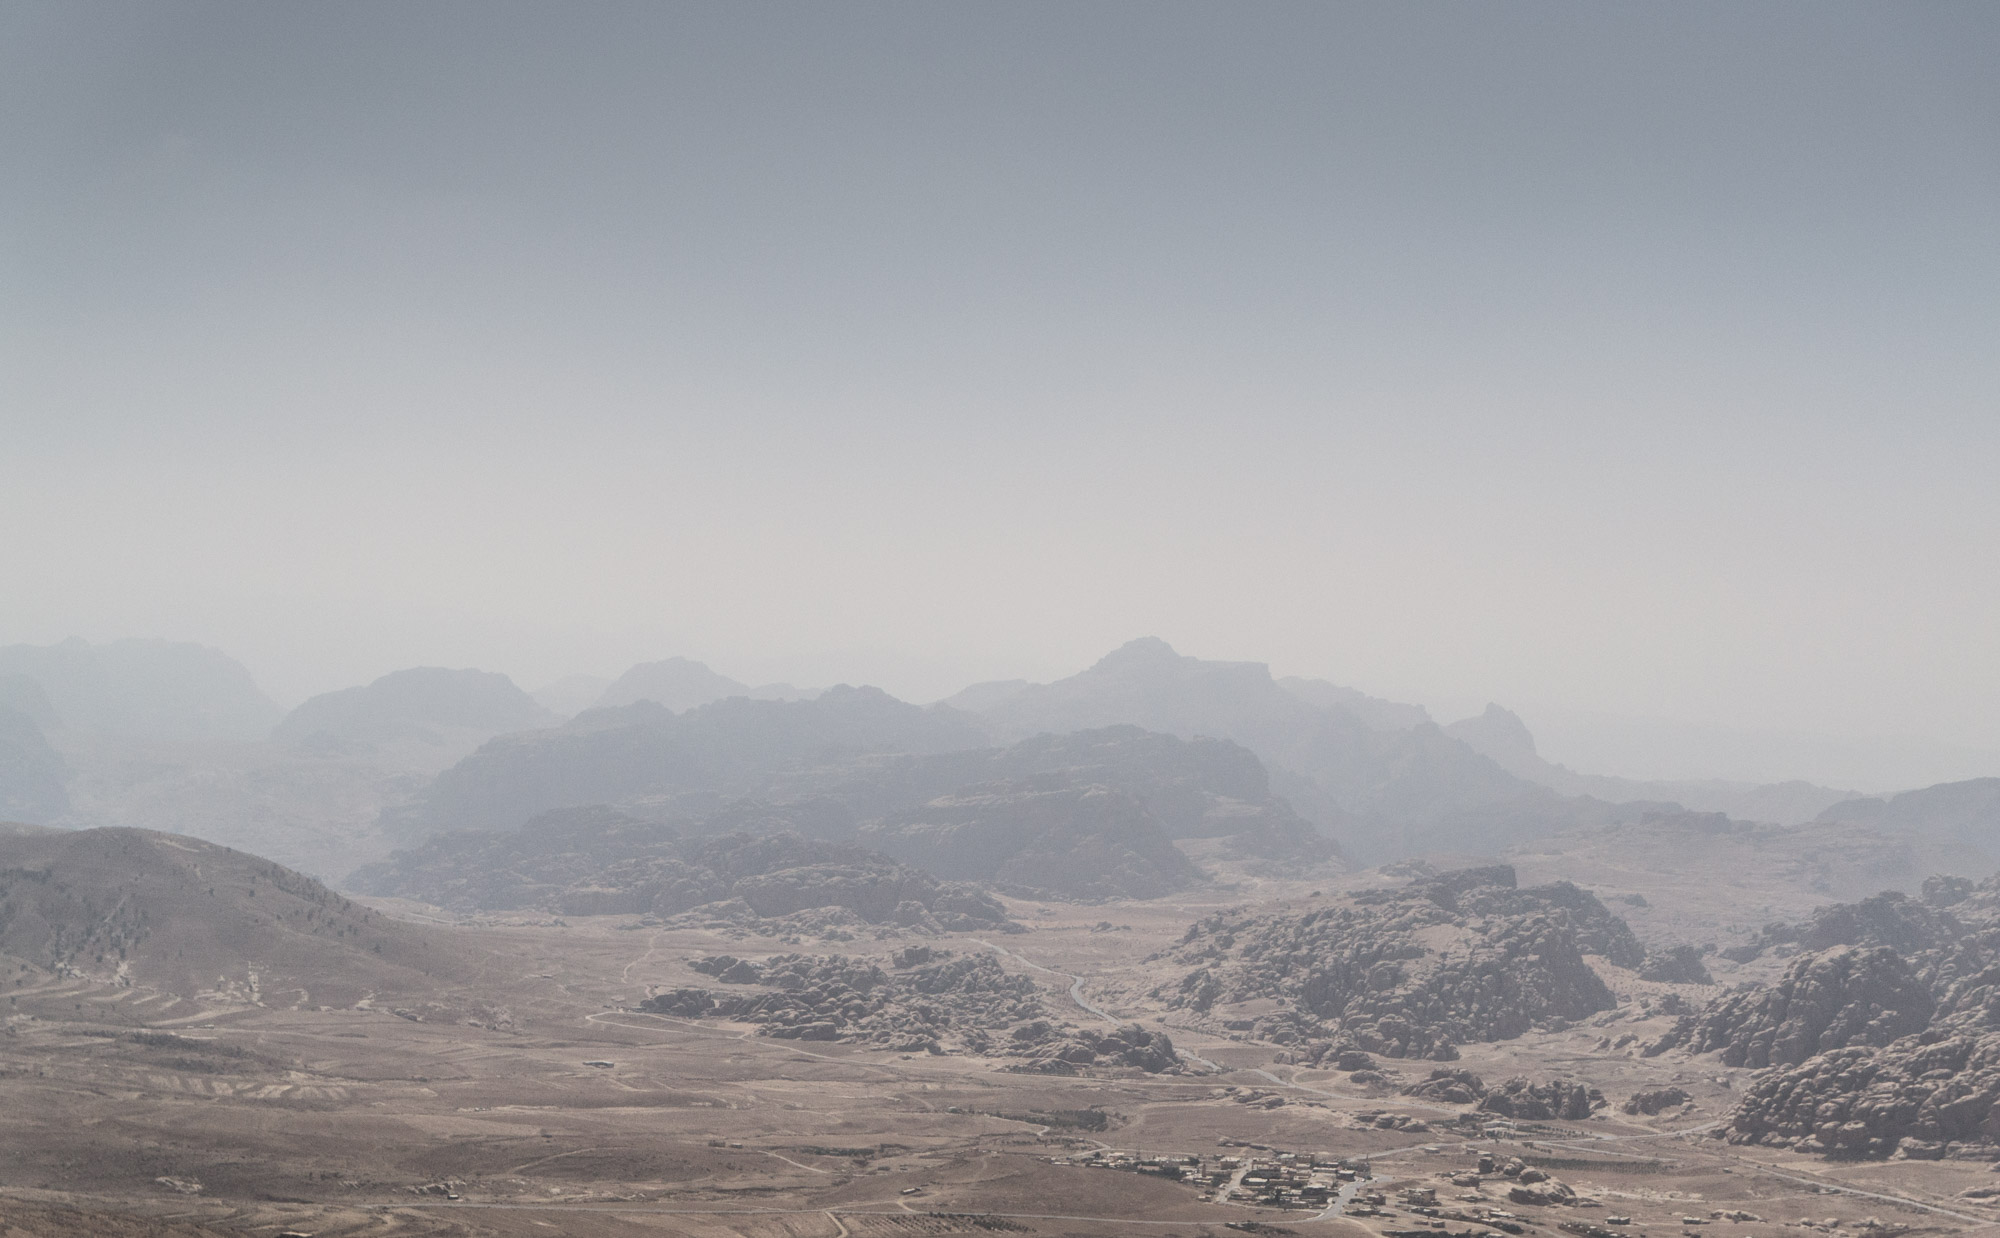 Al-Baydha, Jordan